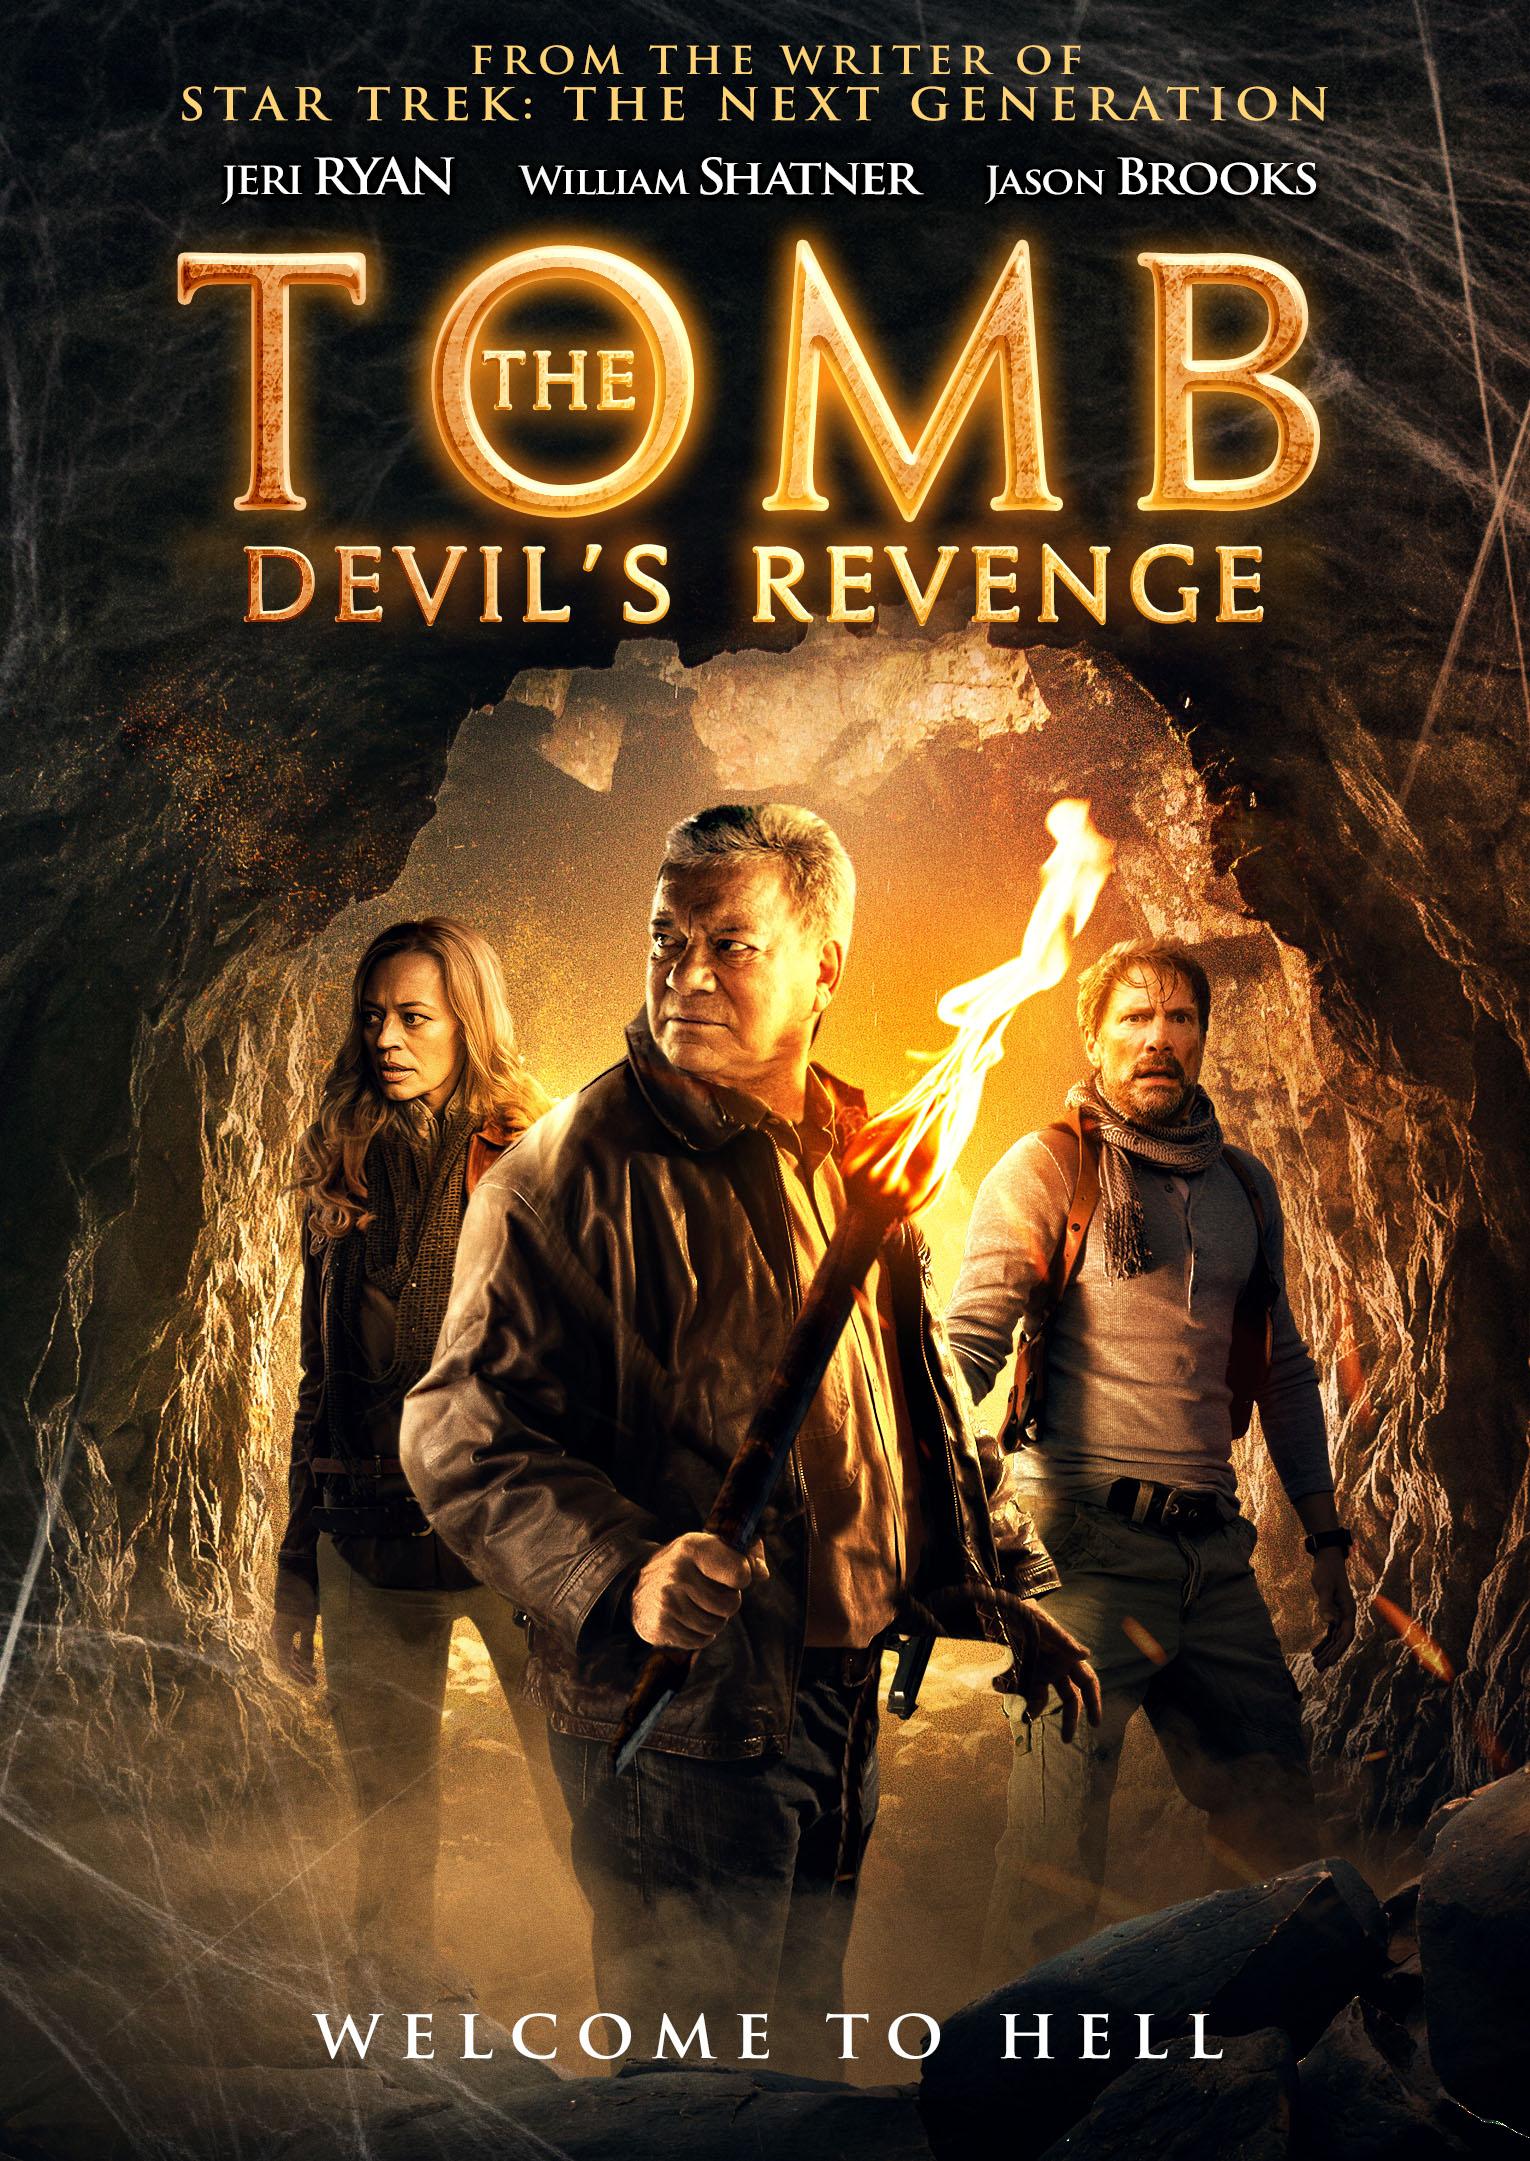 The tomb devil's revenge